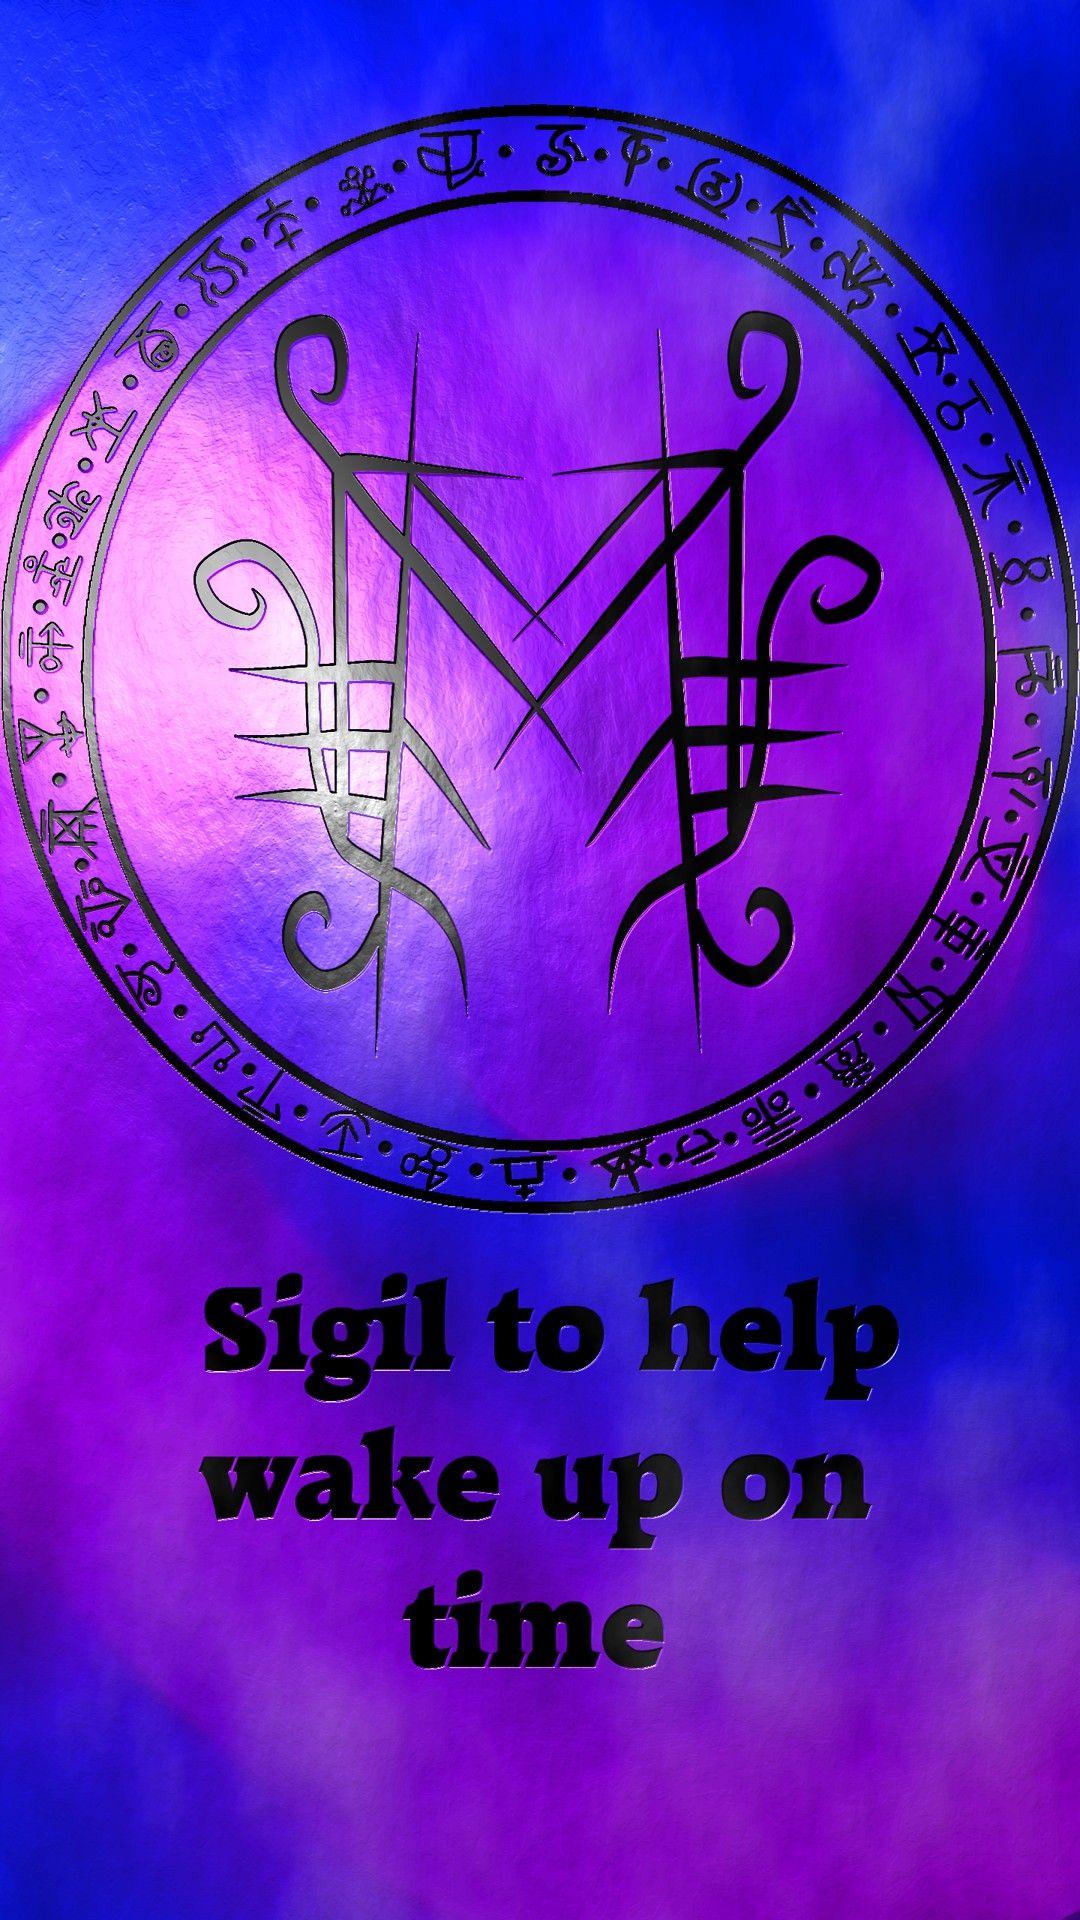 wake up on time | Majiks | Sigil magic, Magic symbols